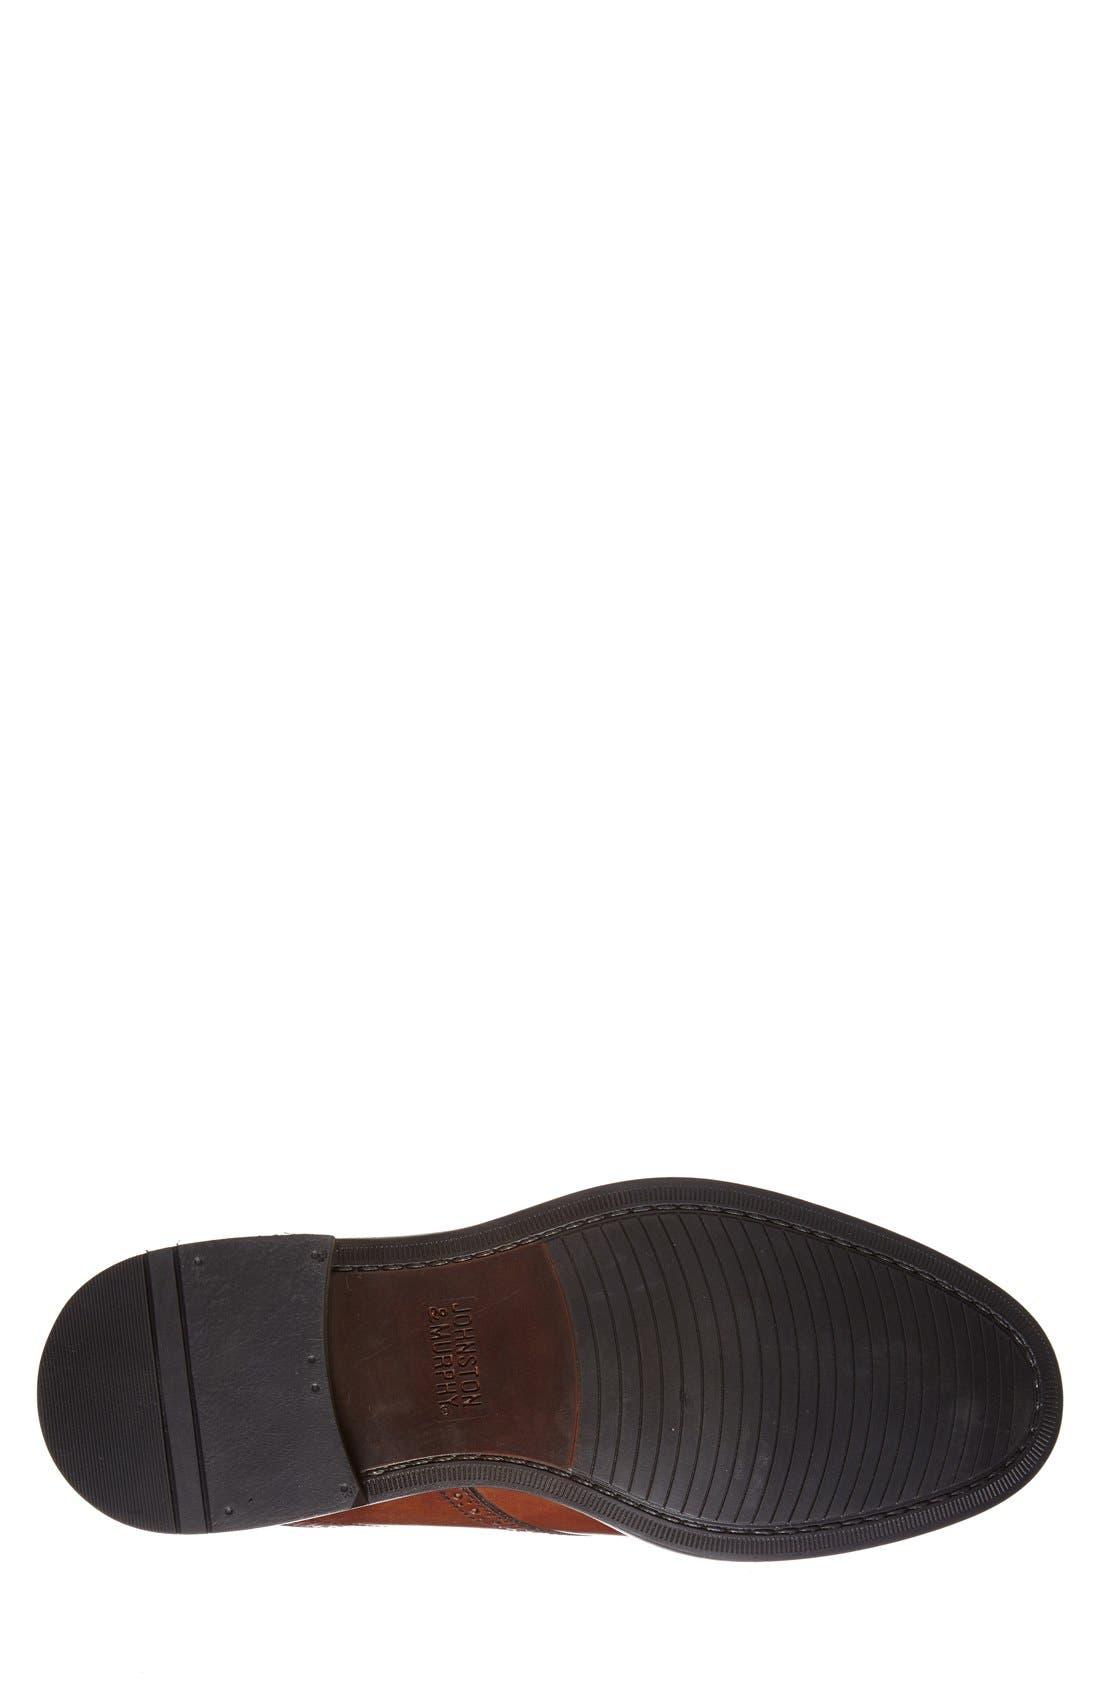 'Tabor' Saddle Shoe,                             Alternate thumbnail 4, color,                             Mahogany